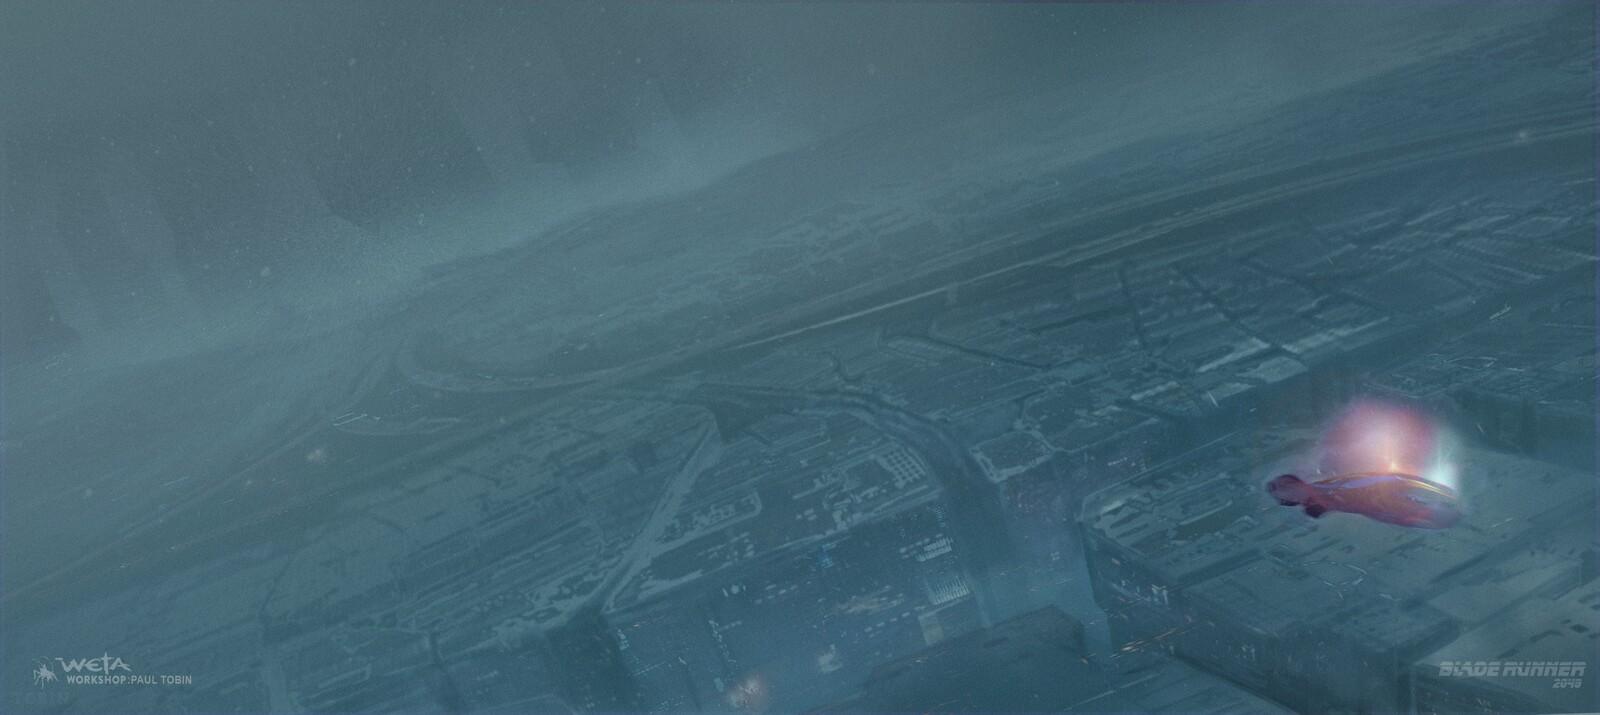 Bladerunner 2049 : K's Approach to LA